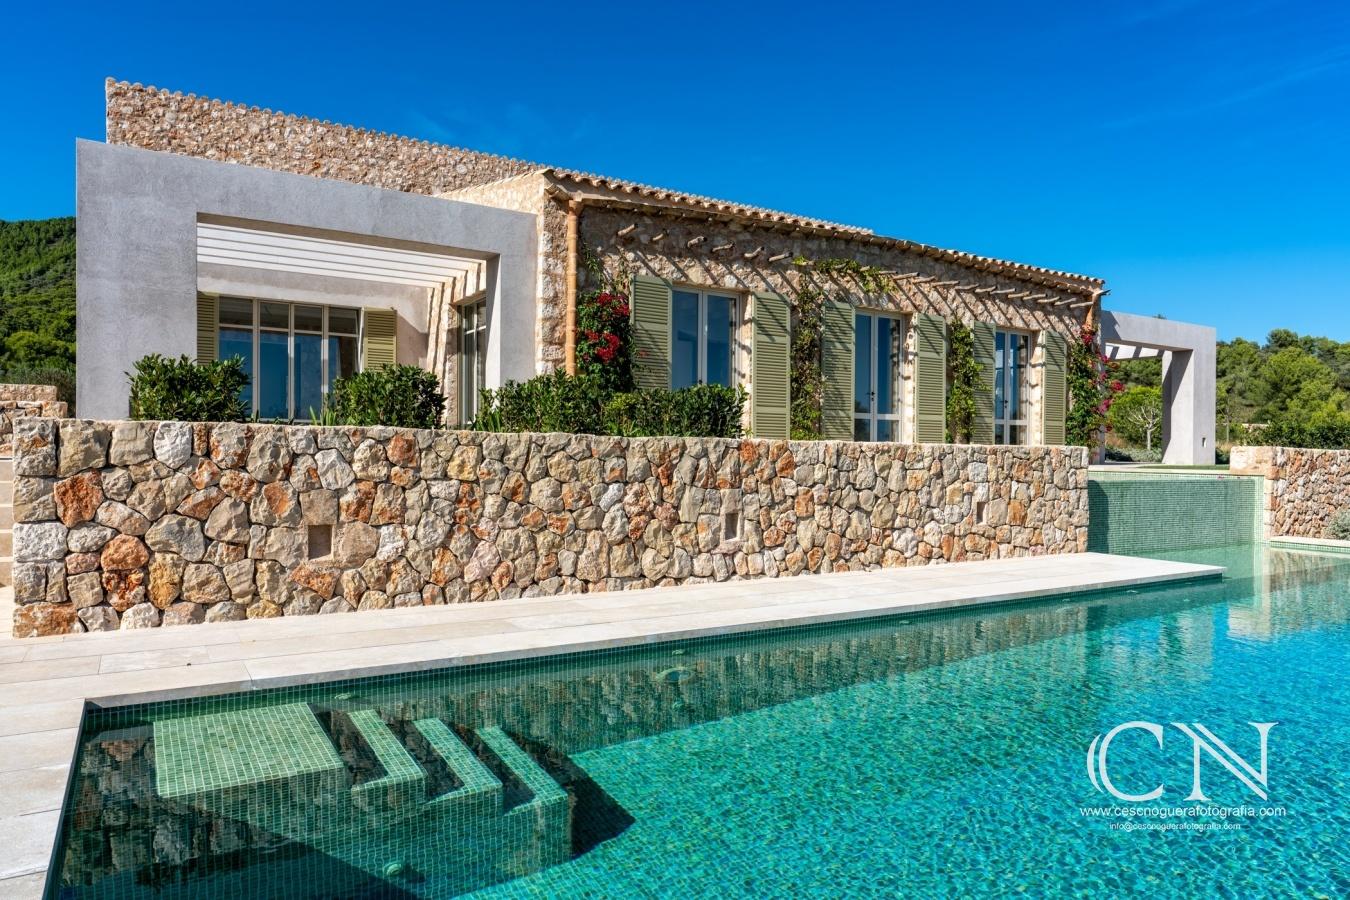 Casa a Santanyi - Cesc Noguera Fotografia,  Architectural & Interior design photographer / Landscape Photography.